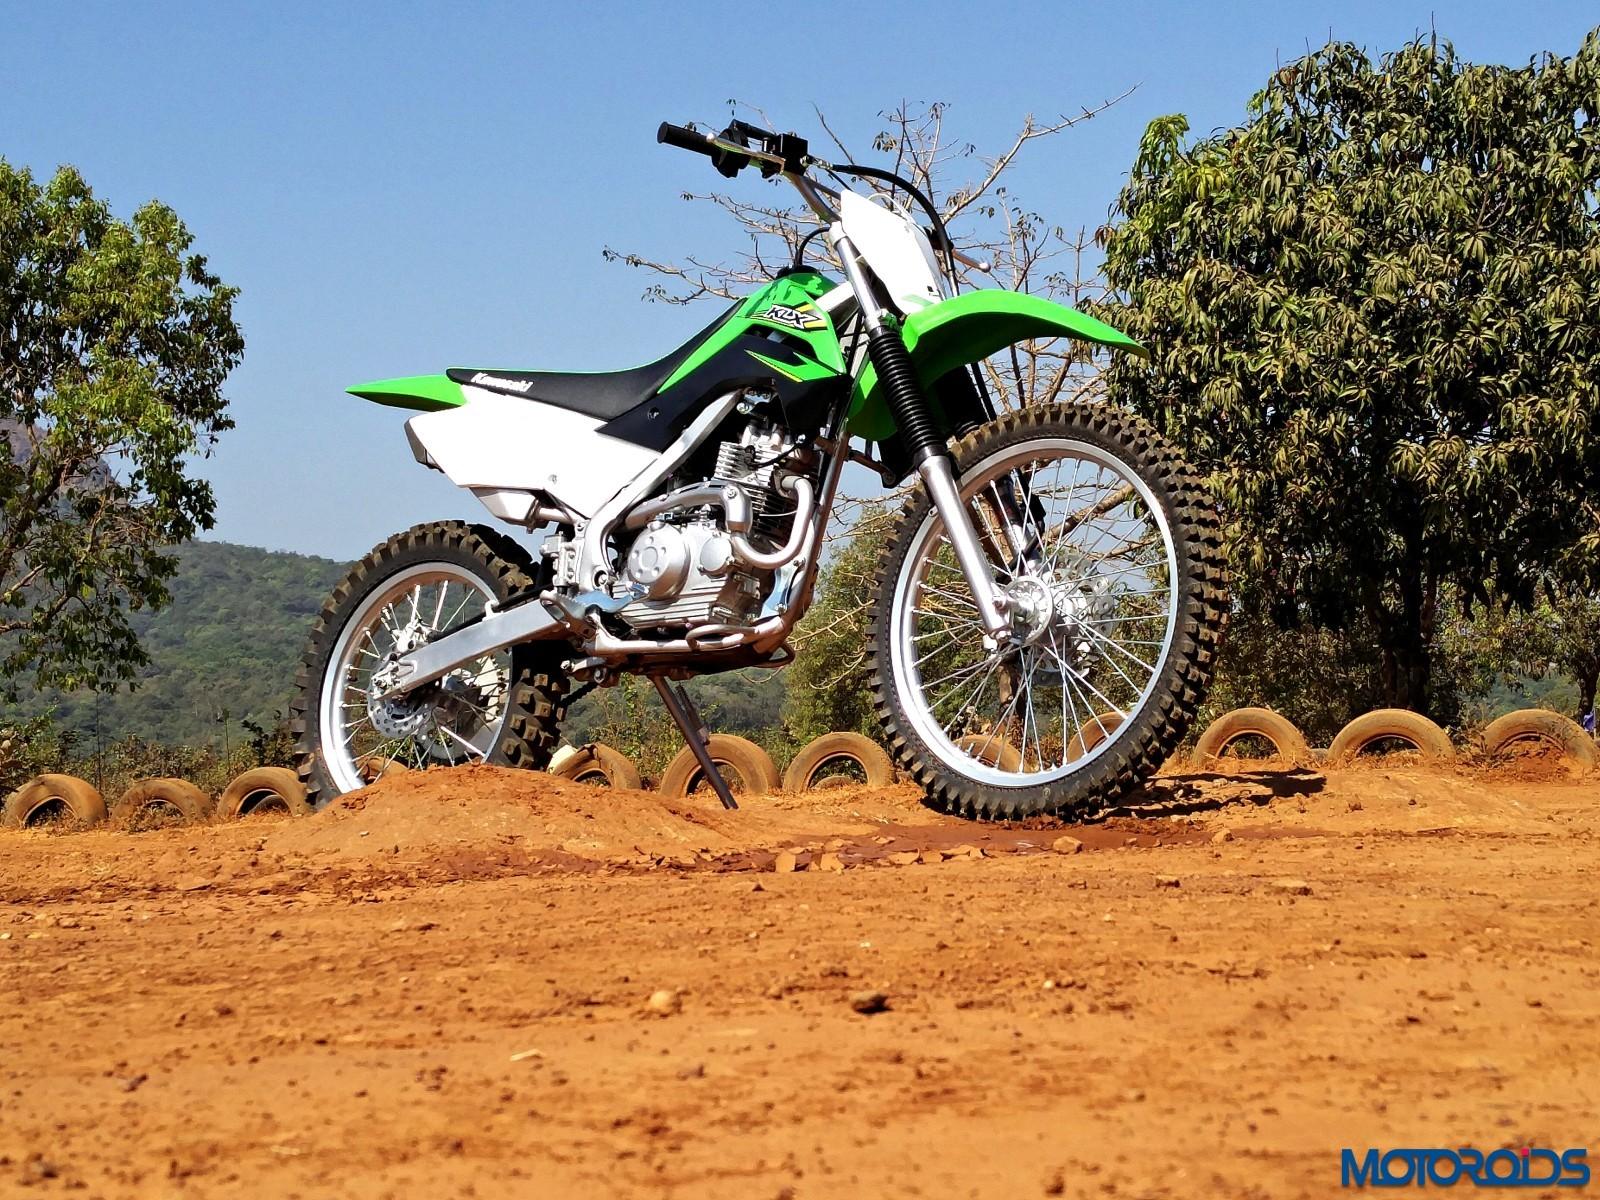 Kawasaki-KLX140G-Ride-Experience-39